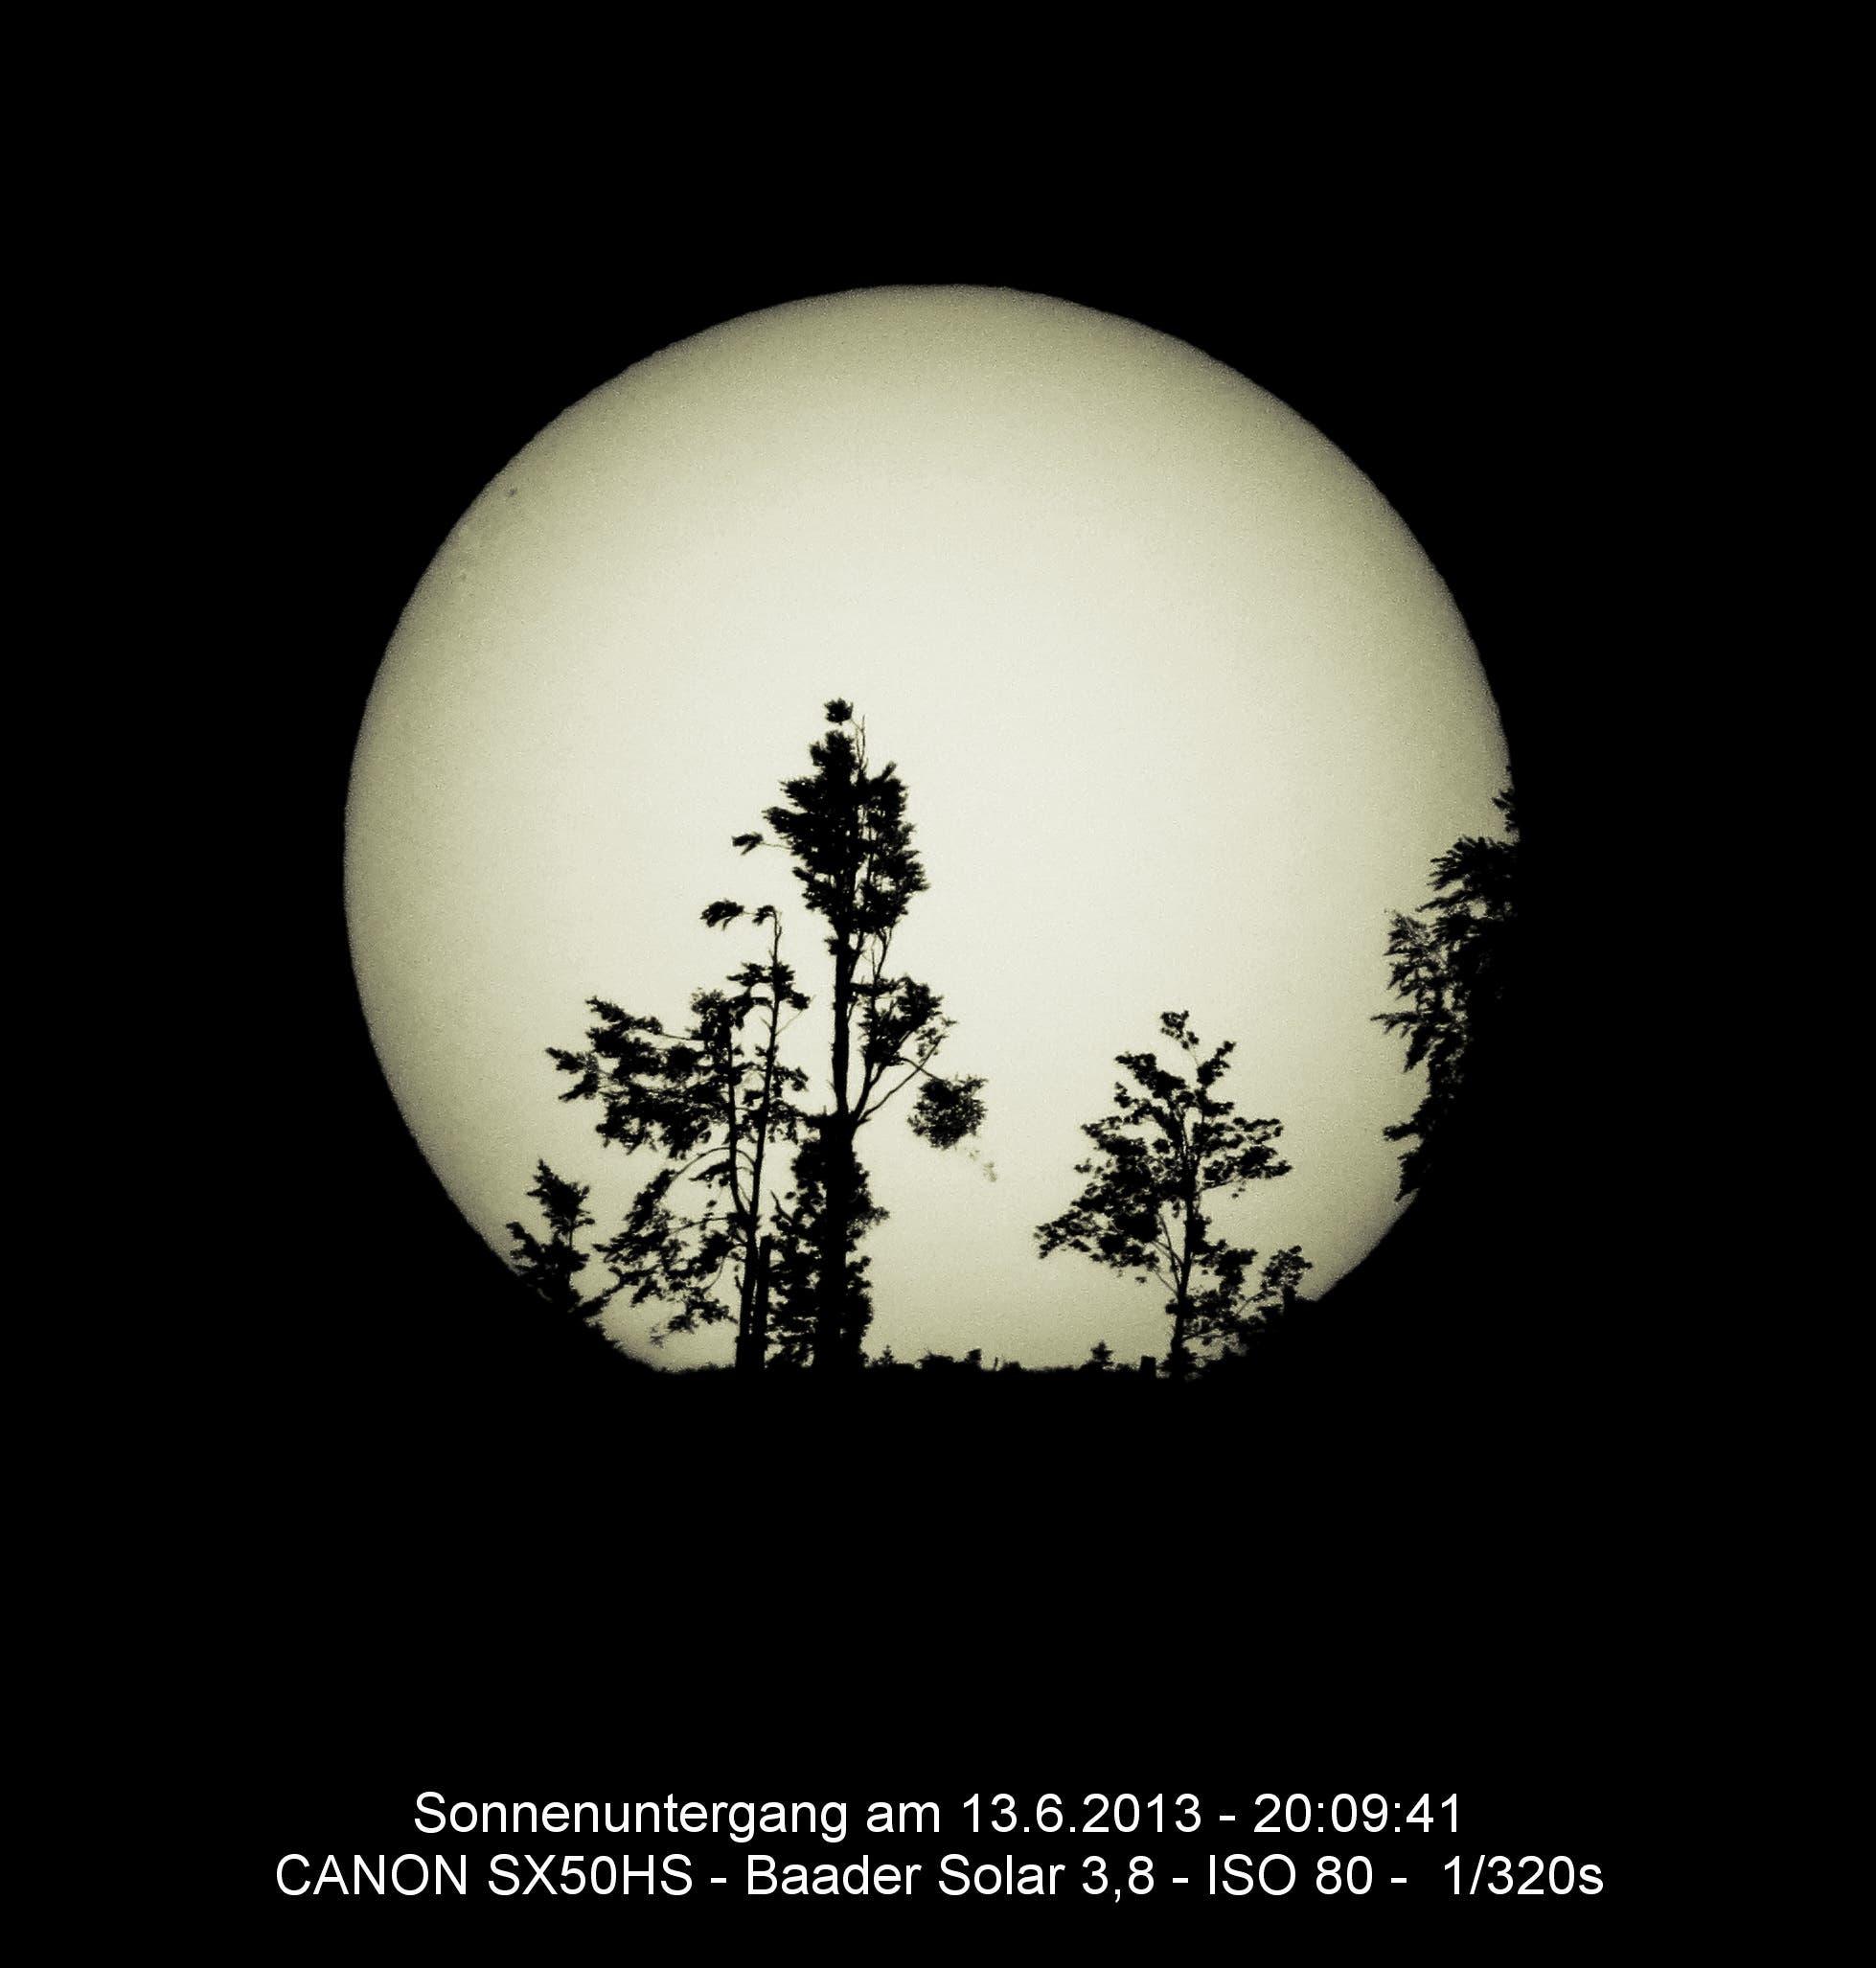 Sonnenuntergang 13. Juni 2013